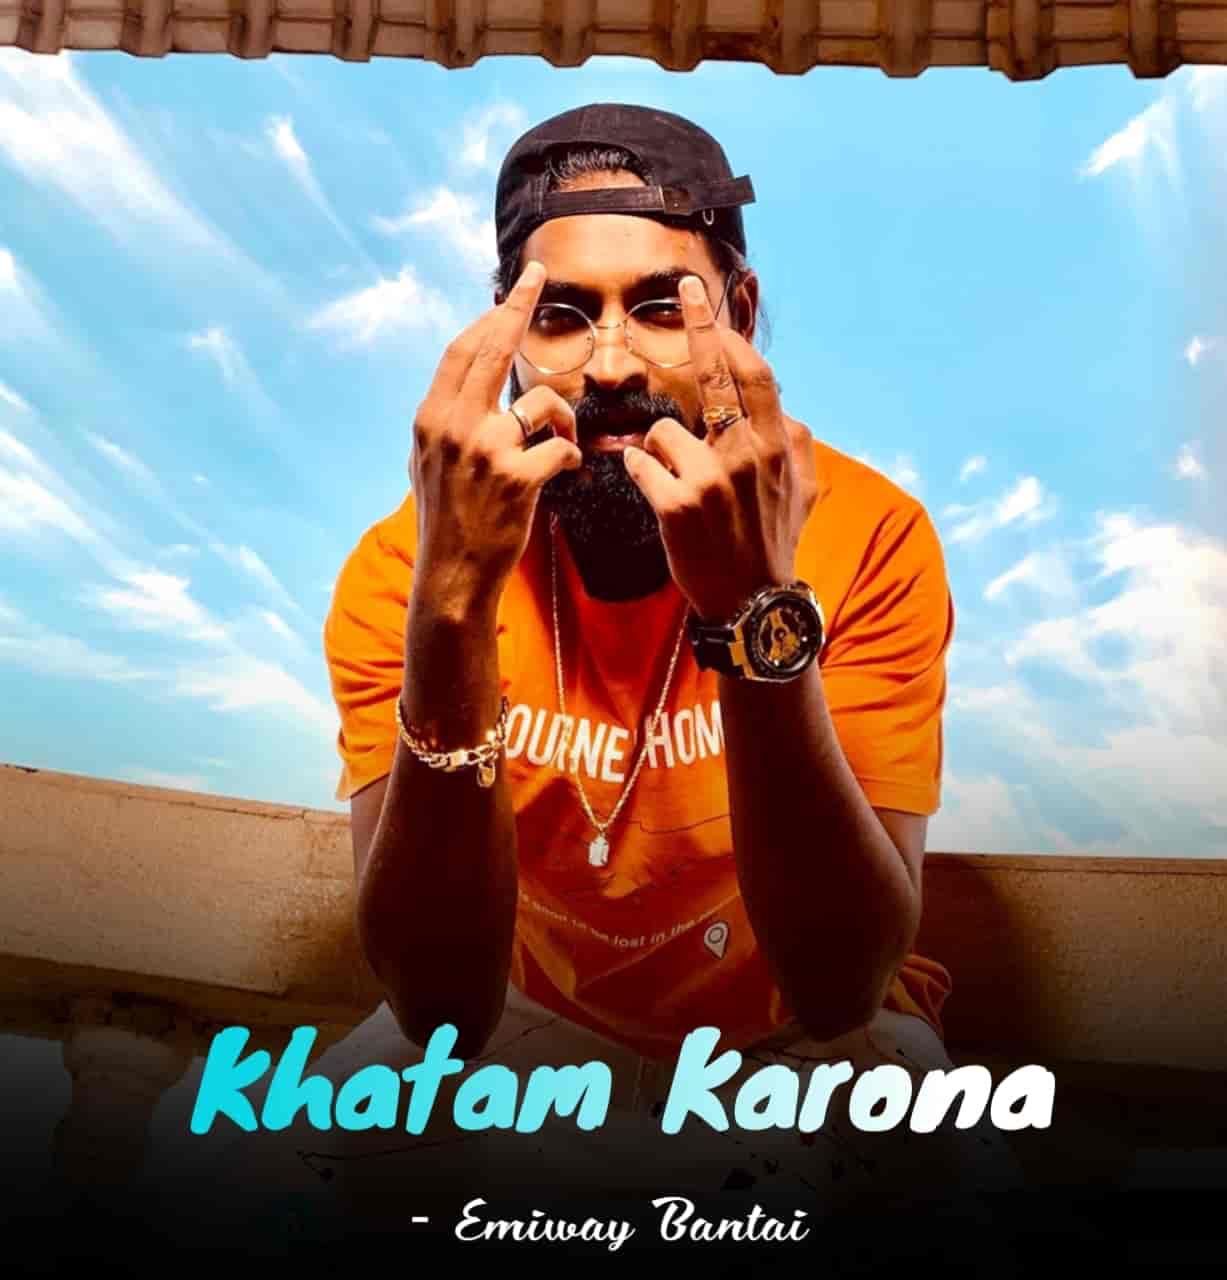 Khatam Karona Rap Song Image By Emiway